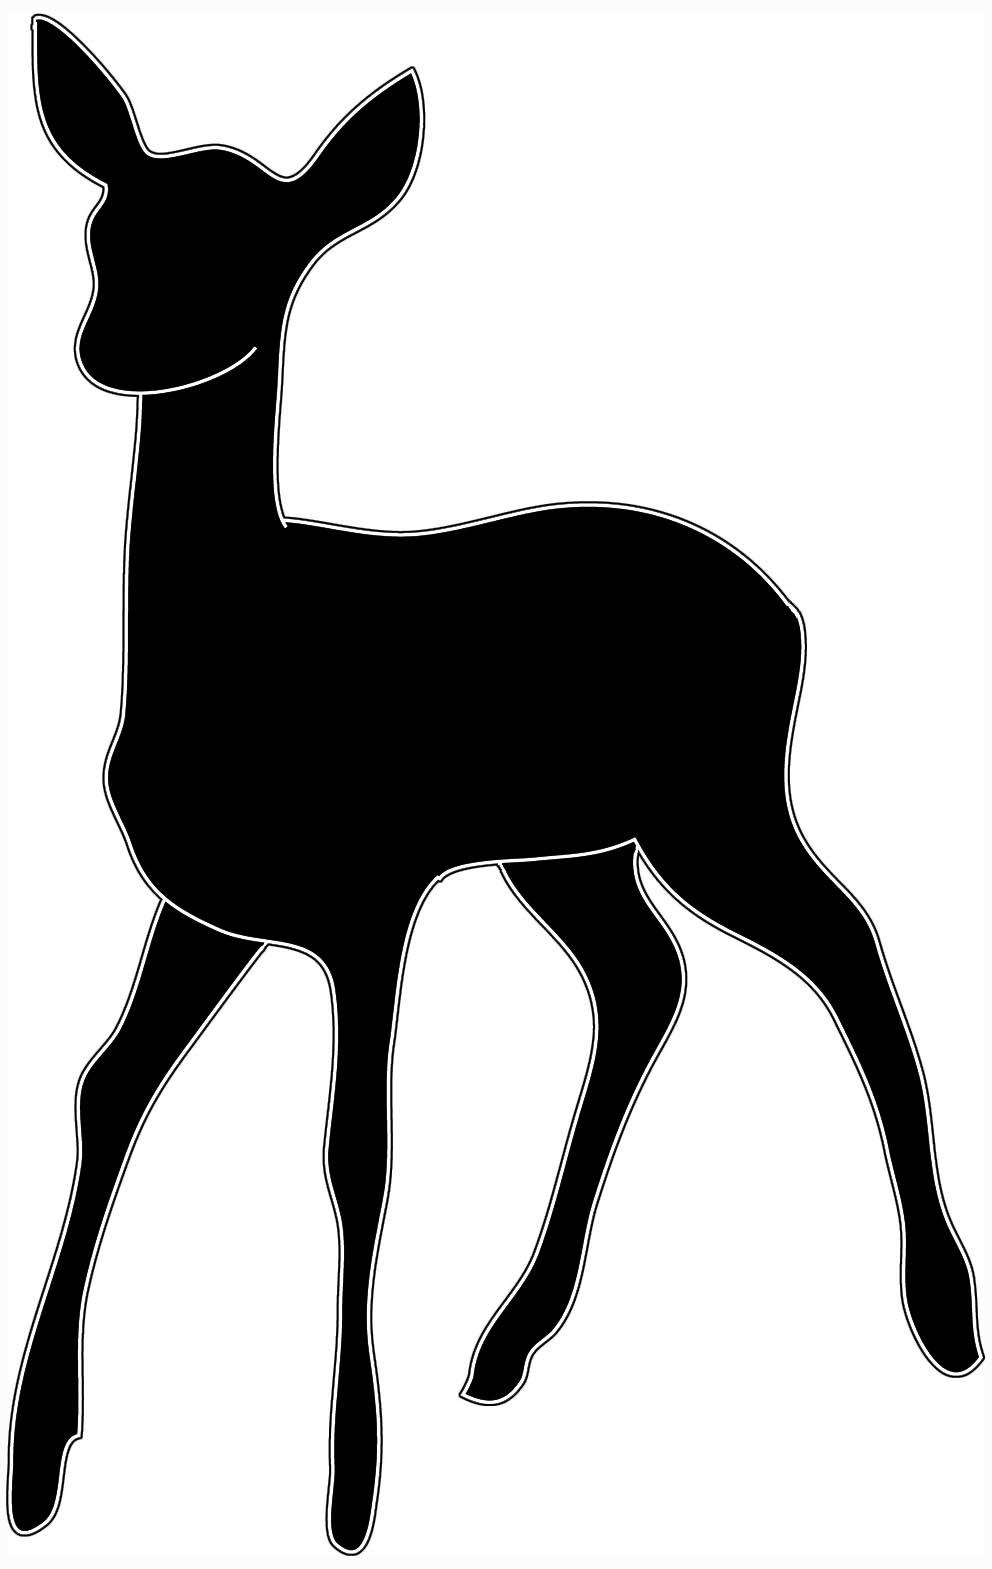 Wildlife clipart silhouette Clipart Clipart Panda mermaid%20clipart%20silhouette Free